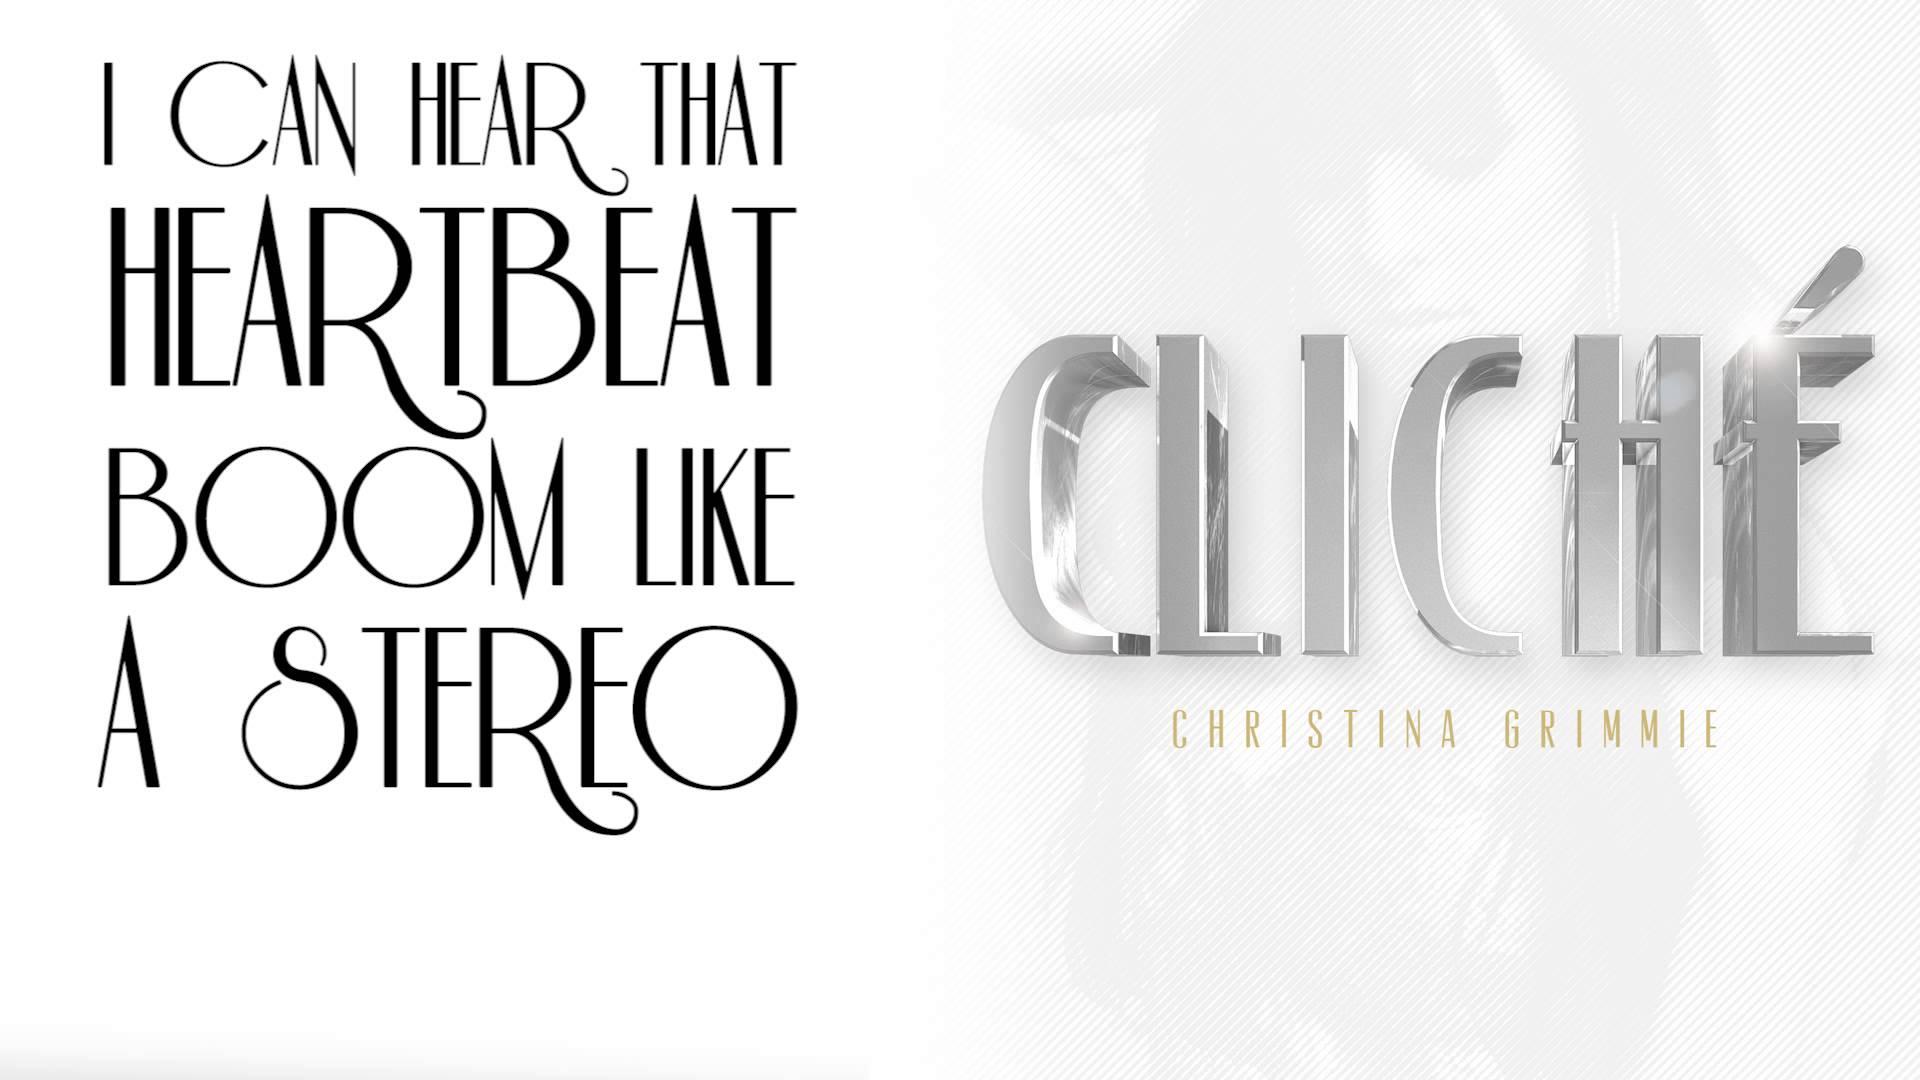 Christina Grimmie – Cliche (Lyric video)